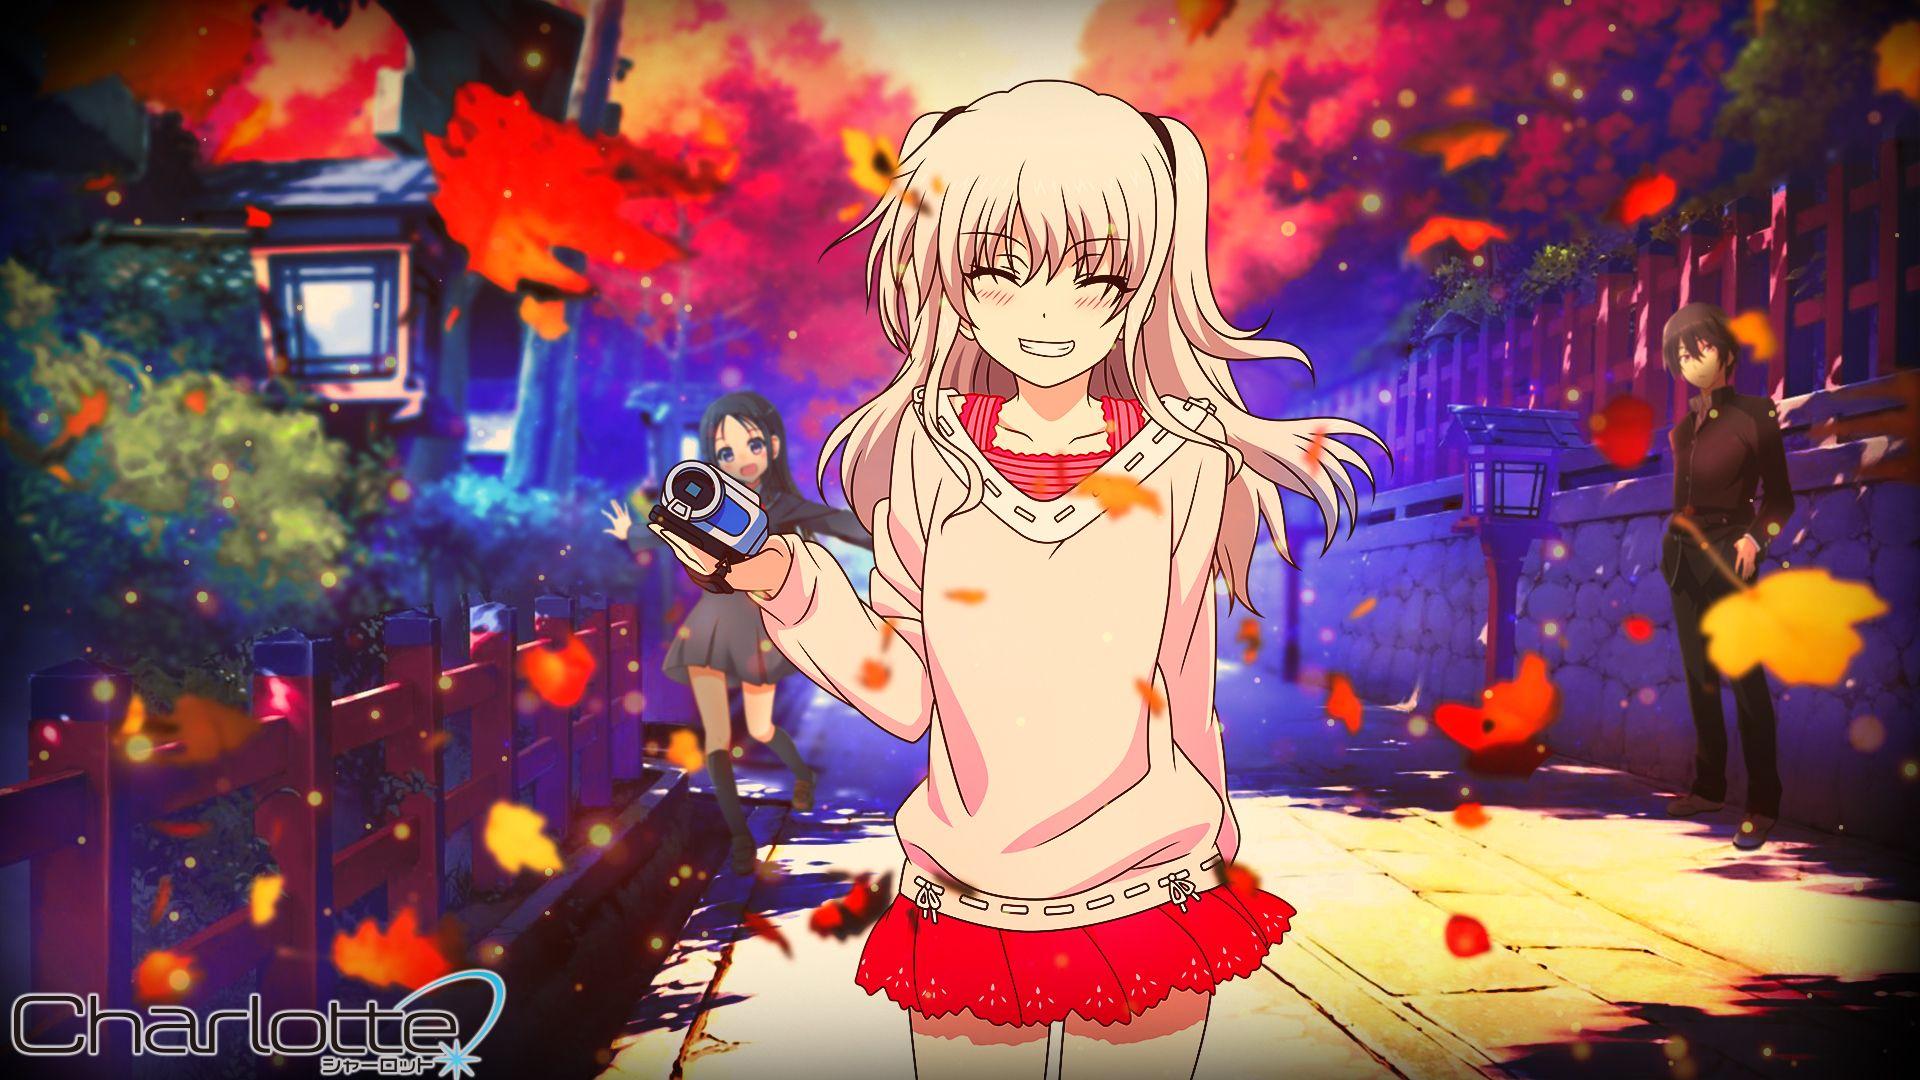 Download Charlotte Hd Backgrounds Charlotte Anime Charlotte Wallpaper Anime